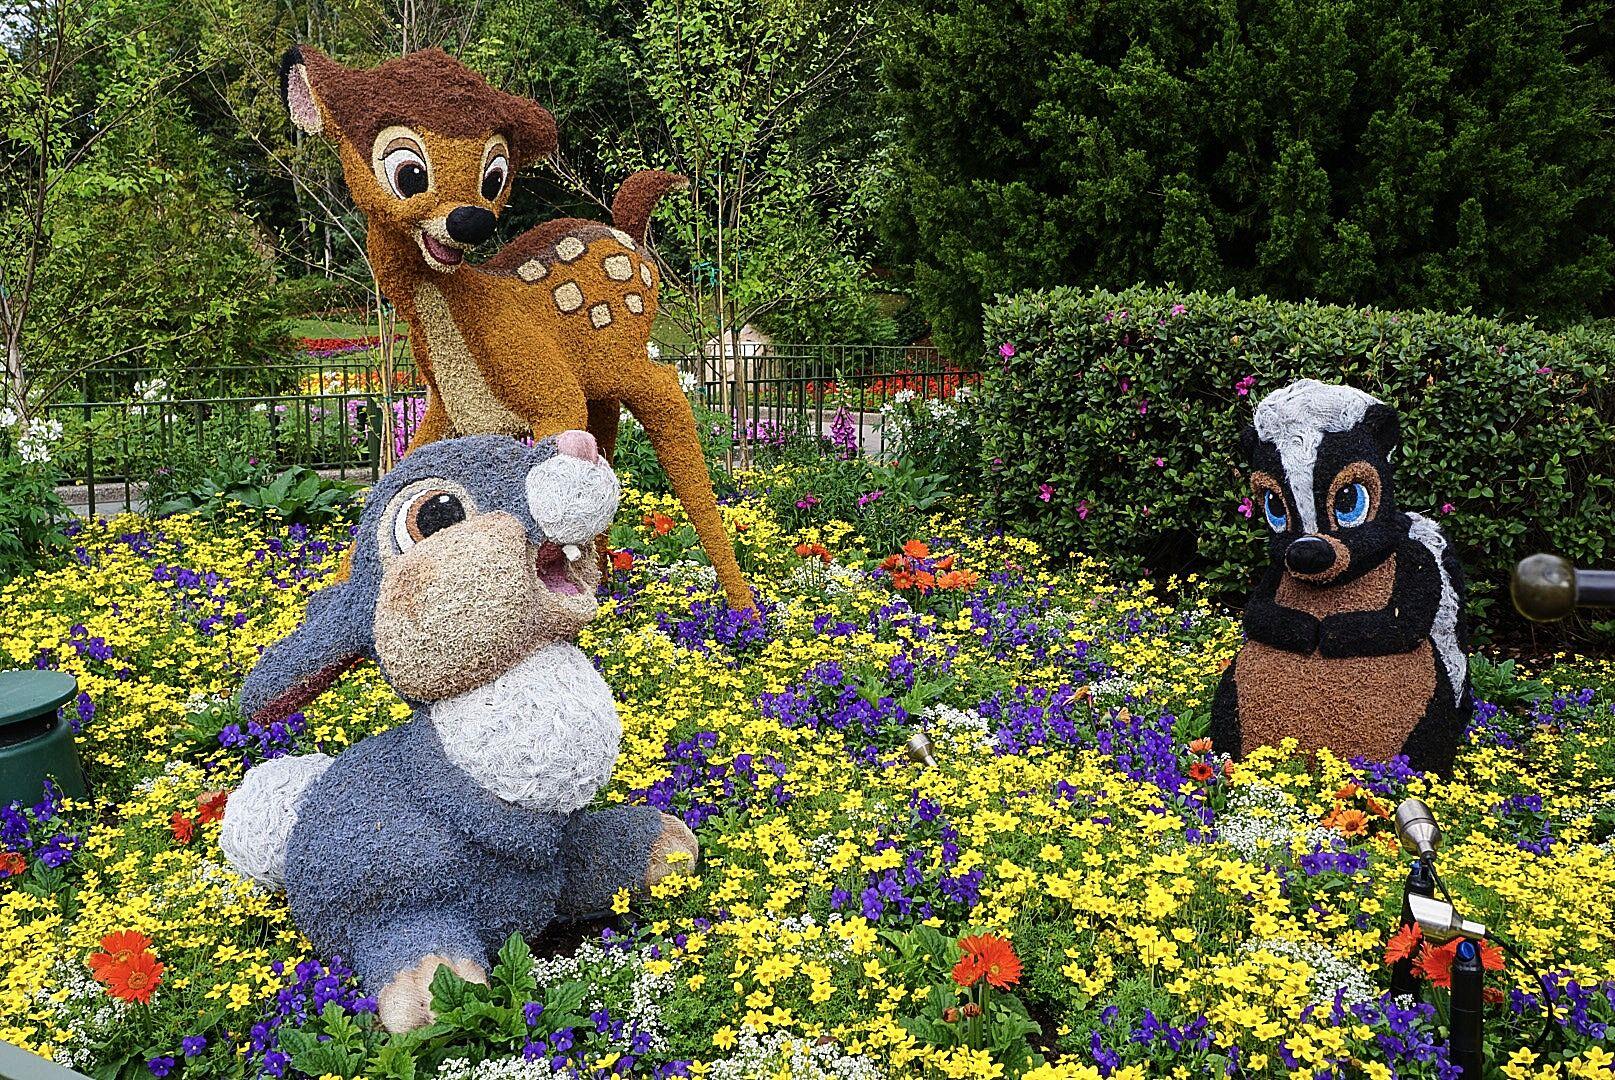 Honey Brings The Natural Sweetness To Epcot Flower Garden Festival